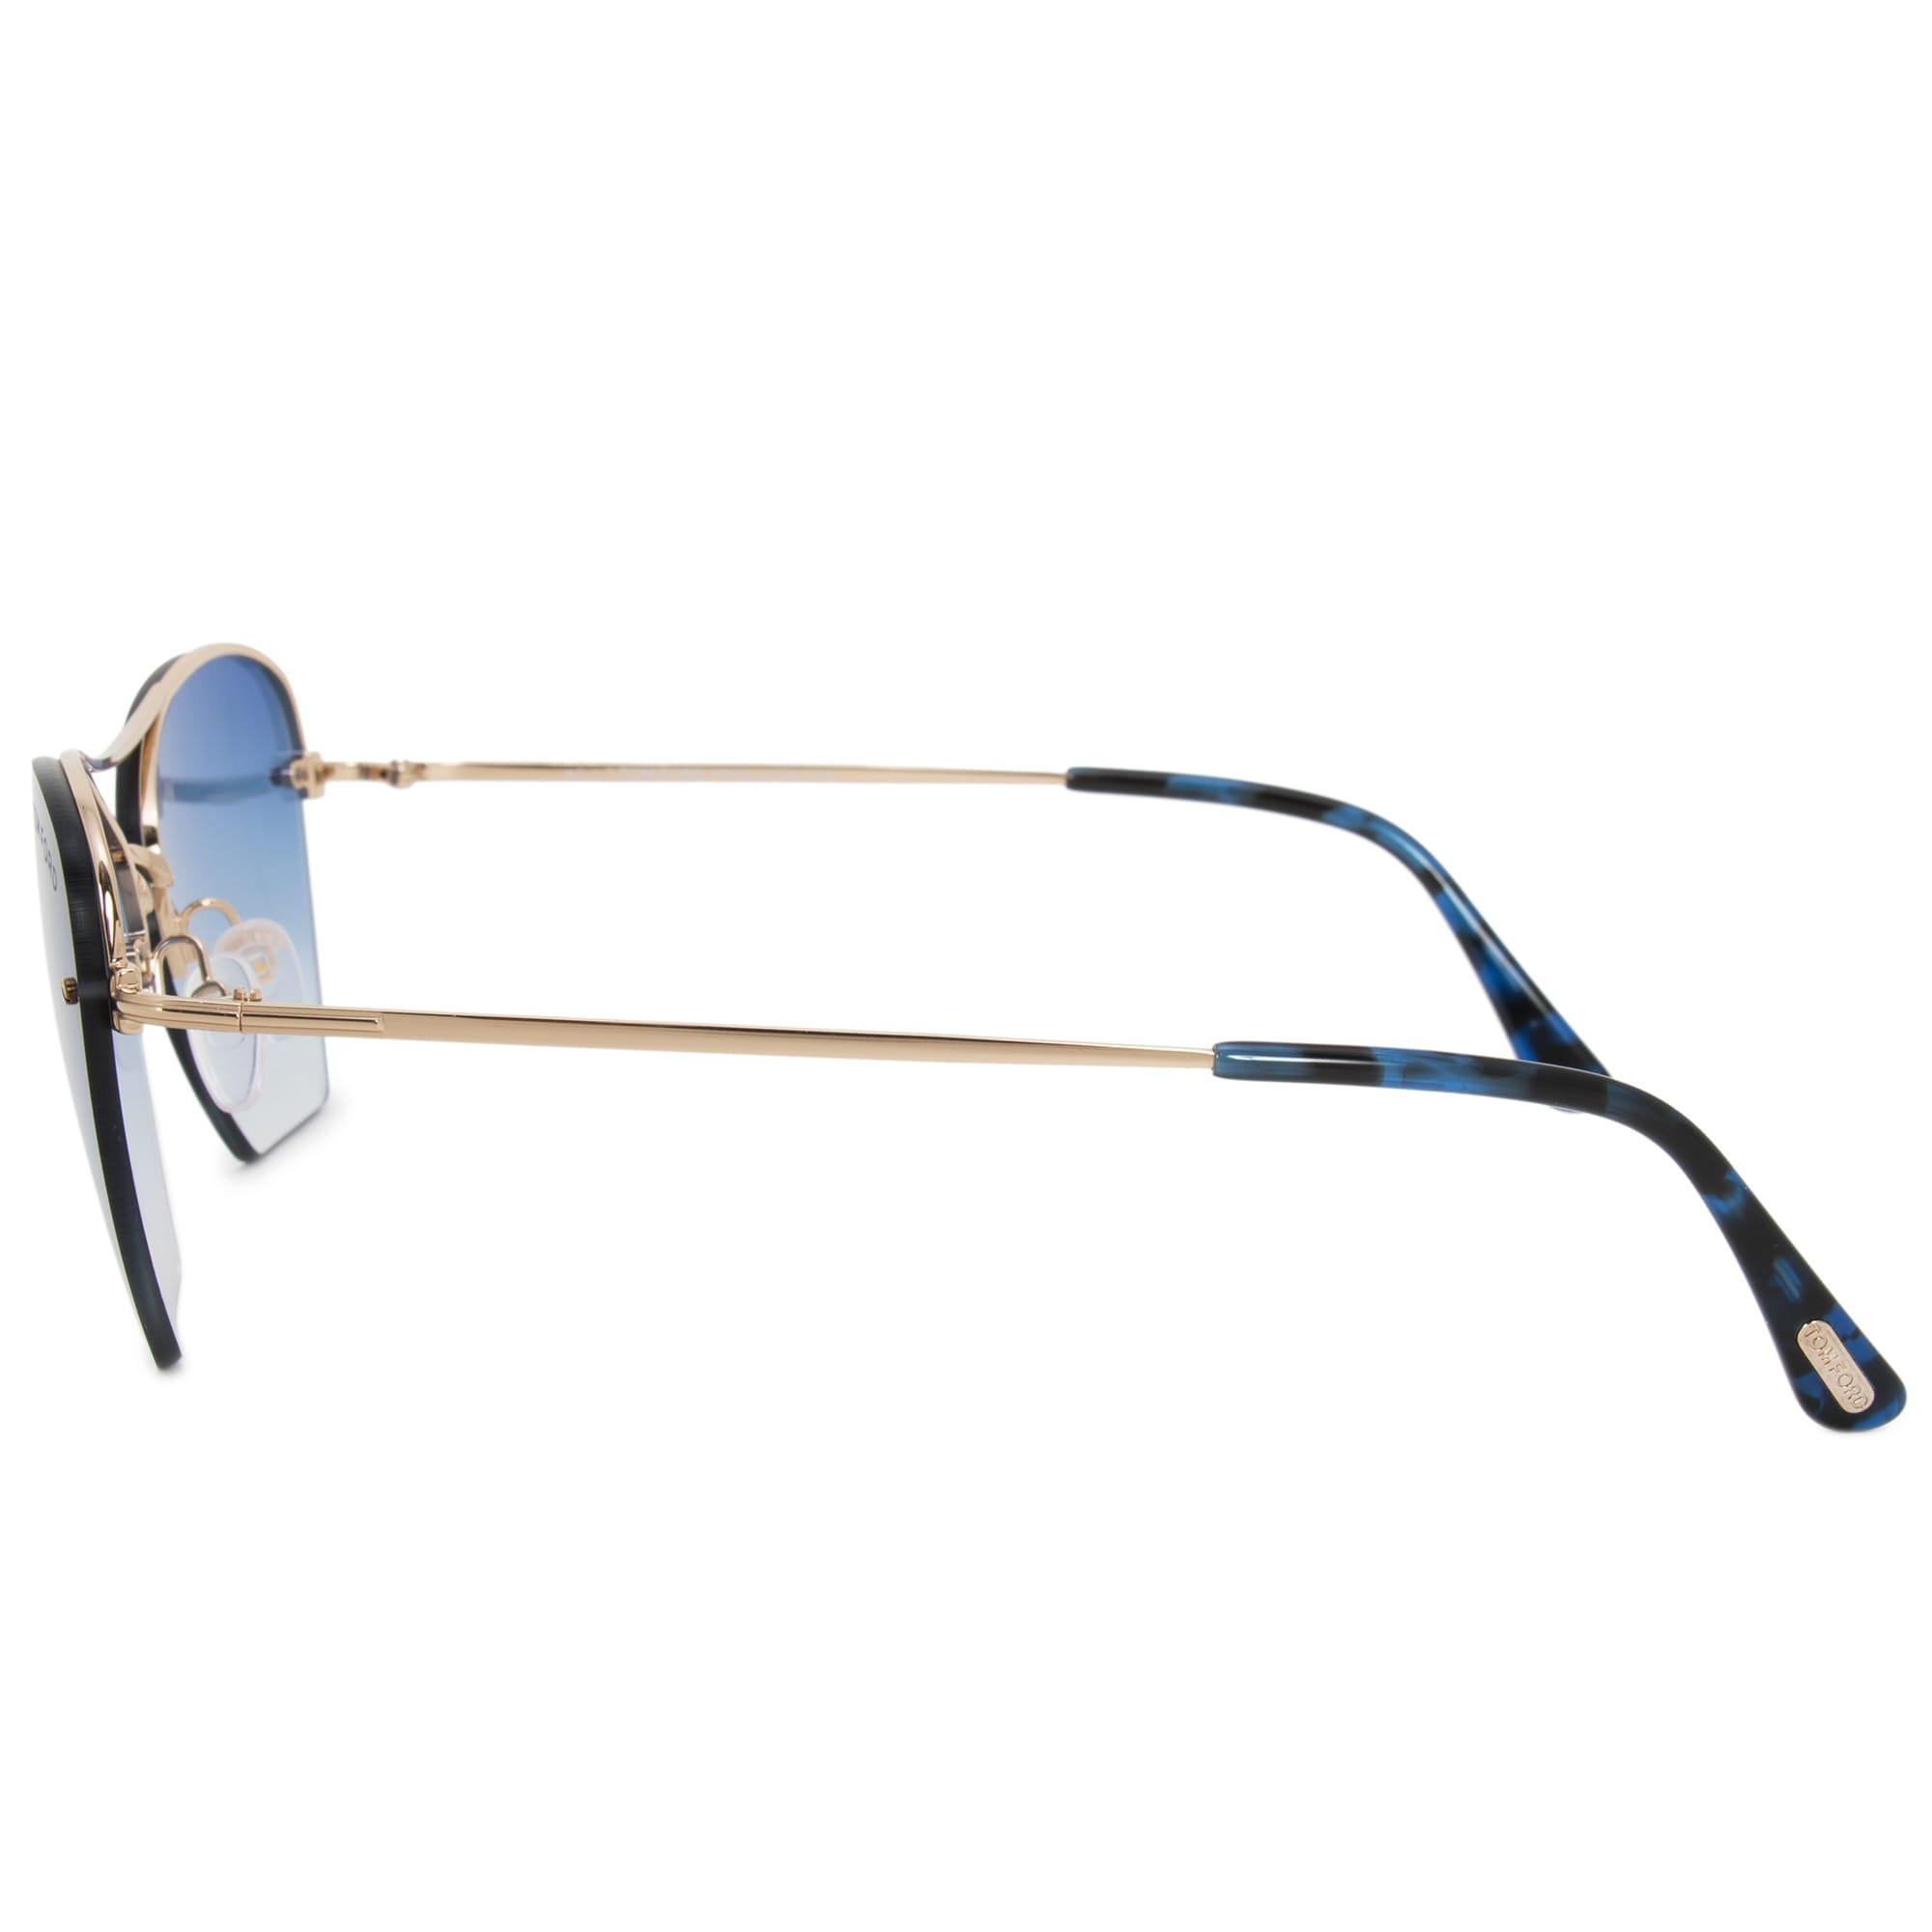 c6628ffeb8d34 Shop Tom Ford Annabel Aviator Sunglasses FT0507 28W 58